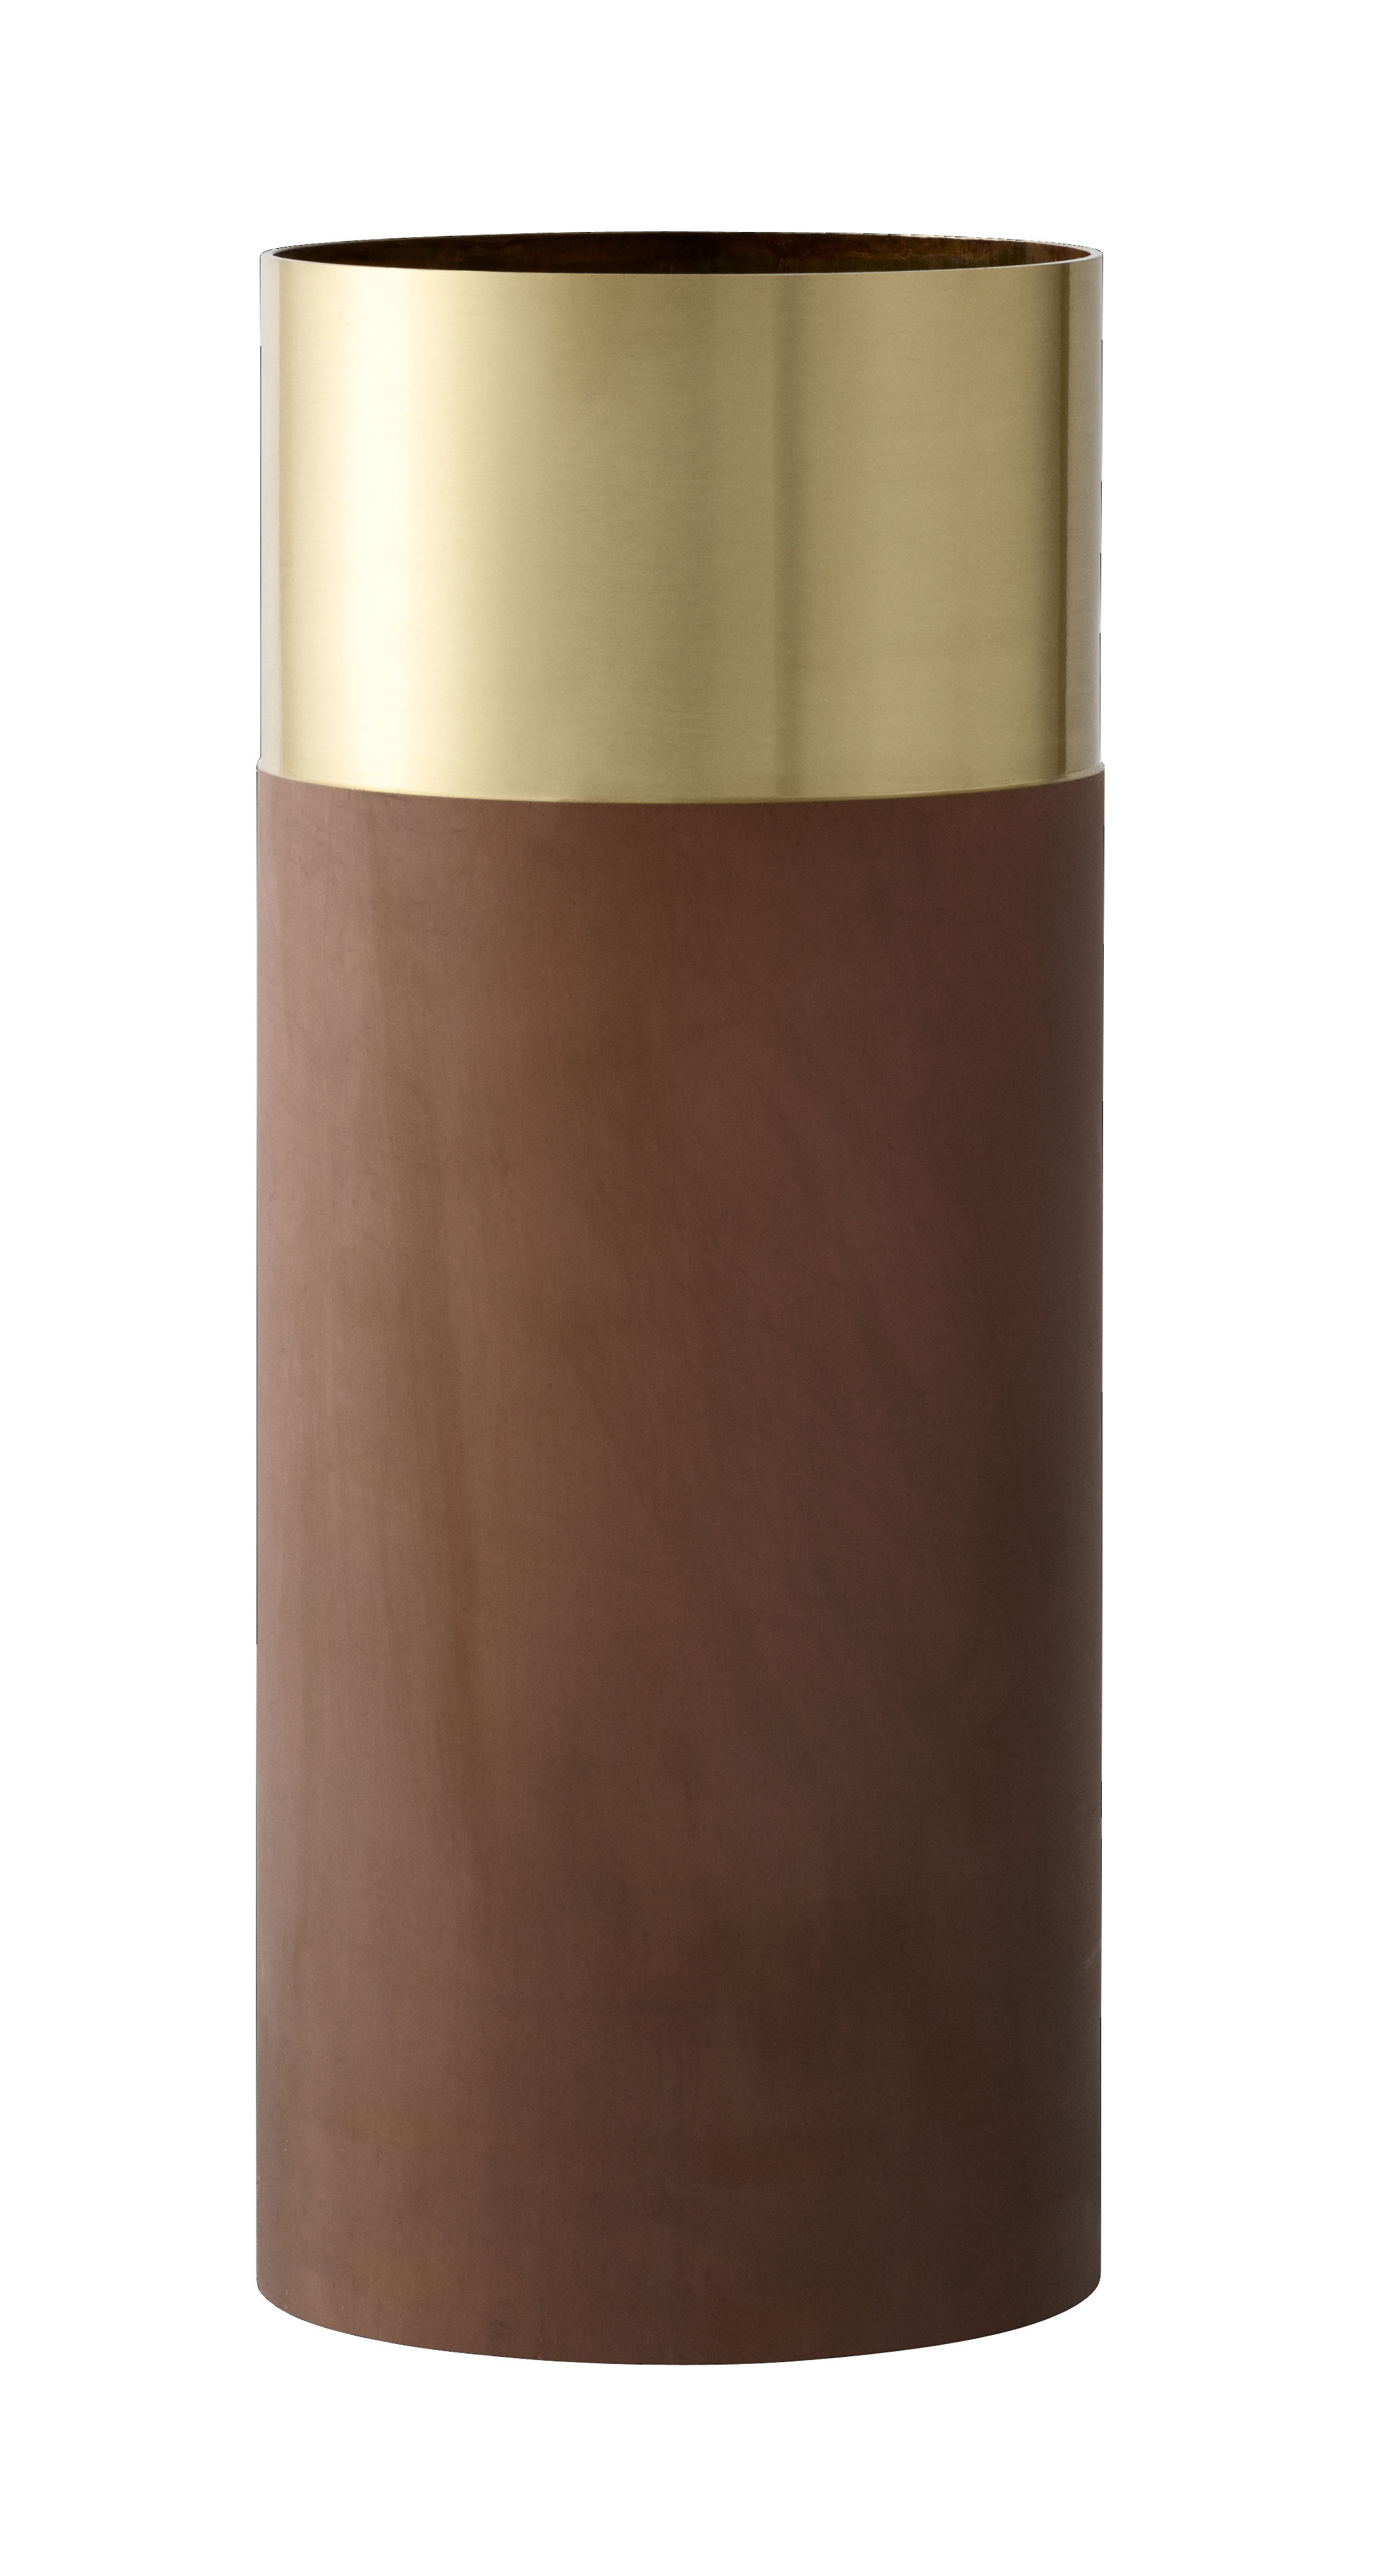 Decoration - Vases - True Colour LP2 Vase - Brass - Ø 10 x  H 24 cm by &tradition - Brass & terracotta - Brass